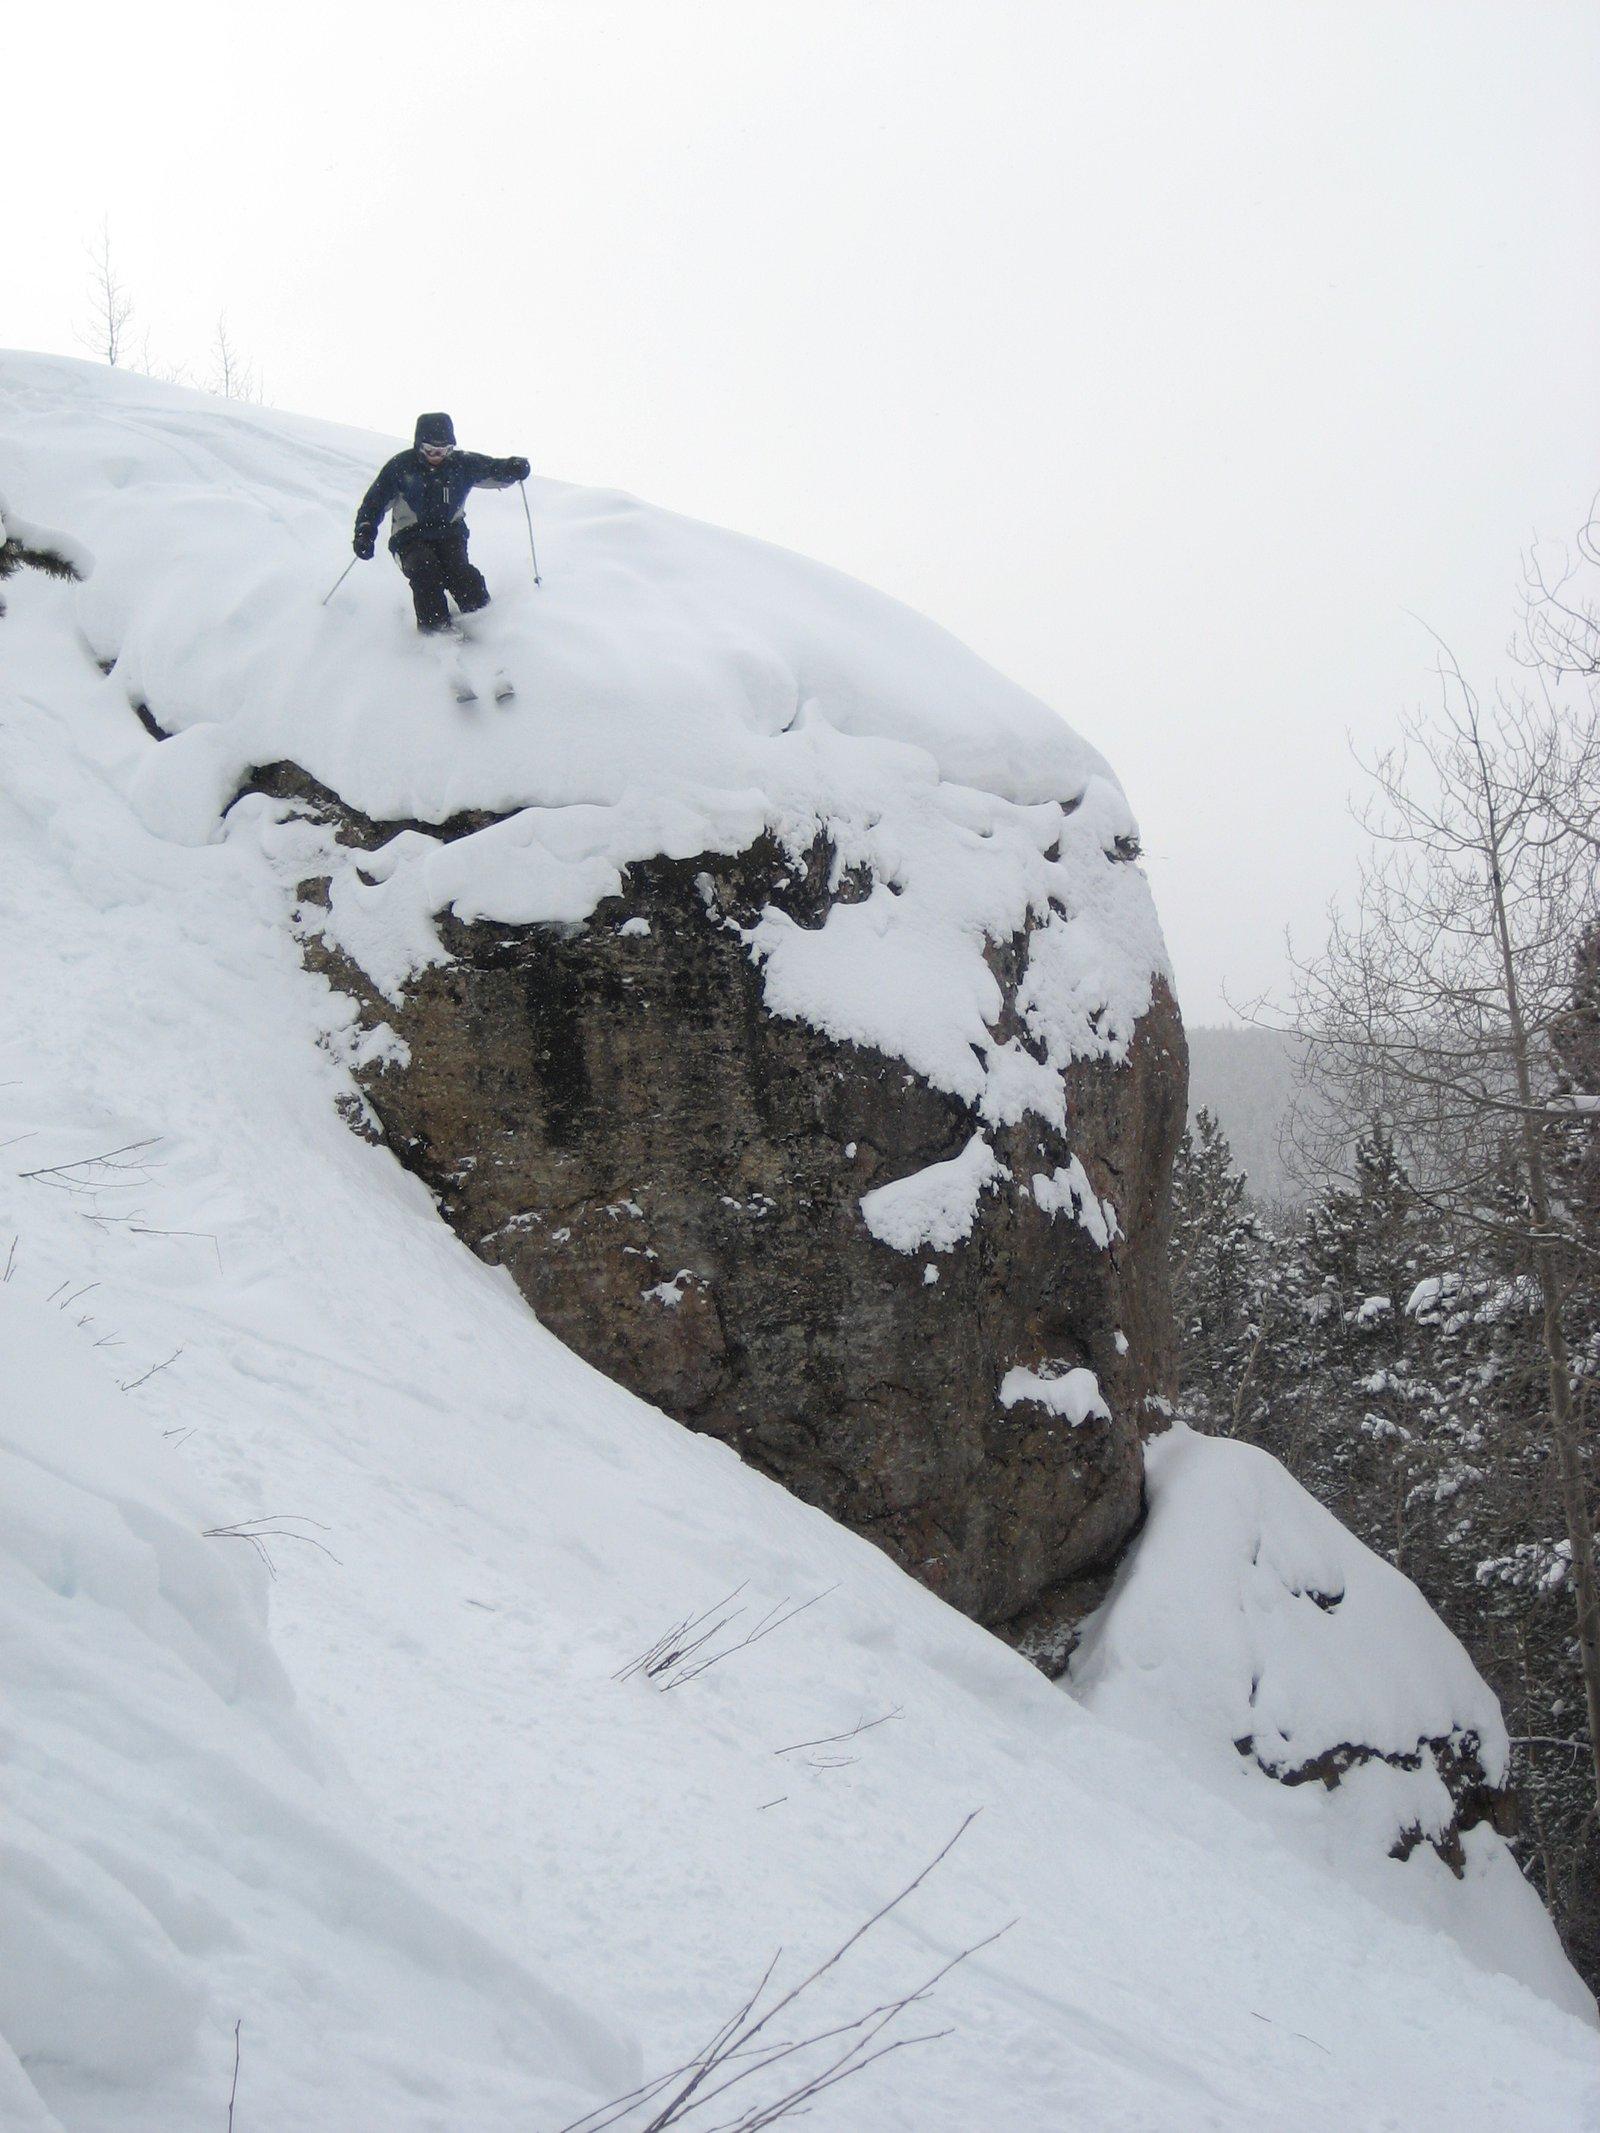 Cliff (small) at Vail